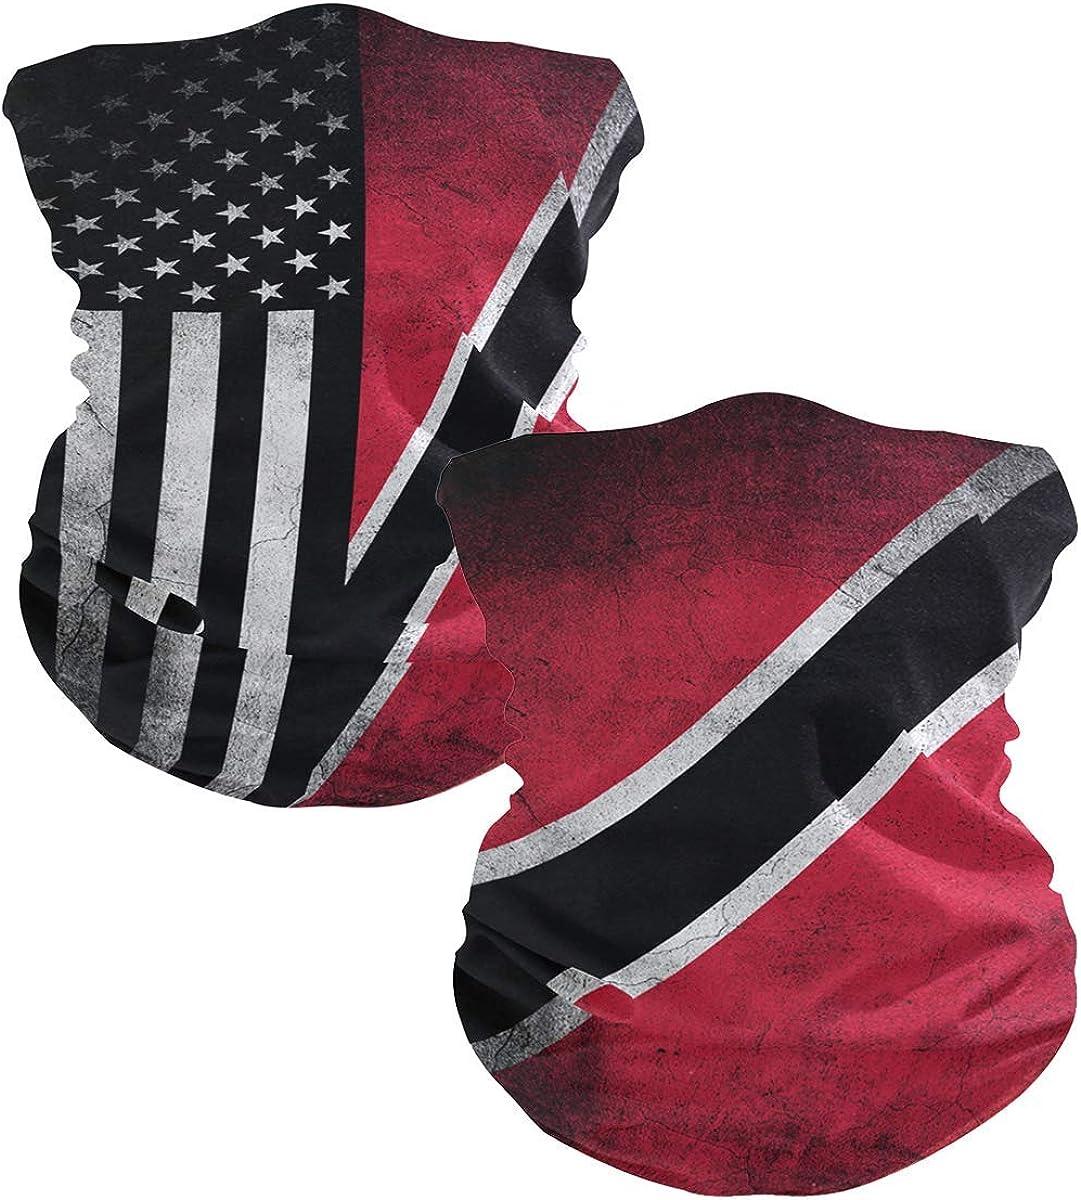 Ningboo 2Pcs Grunge Flag Face Cheap SALE Start Magic Tube Bandanas Scarf Headwear 4 years warranty